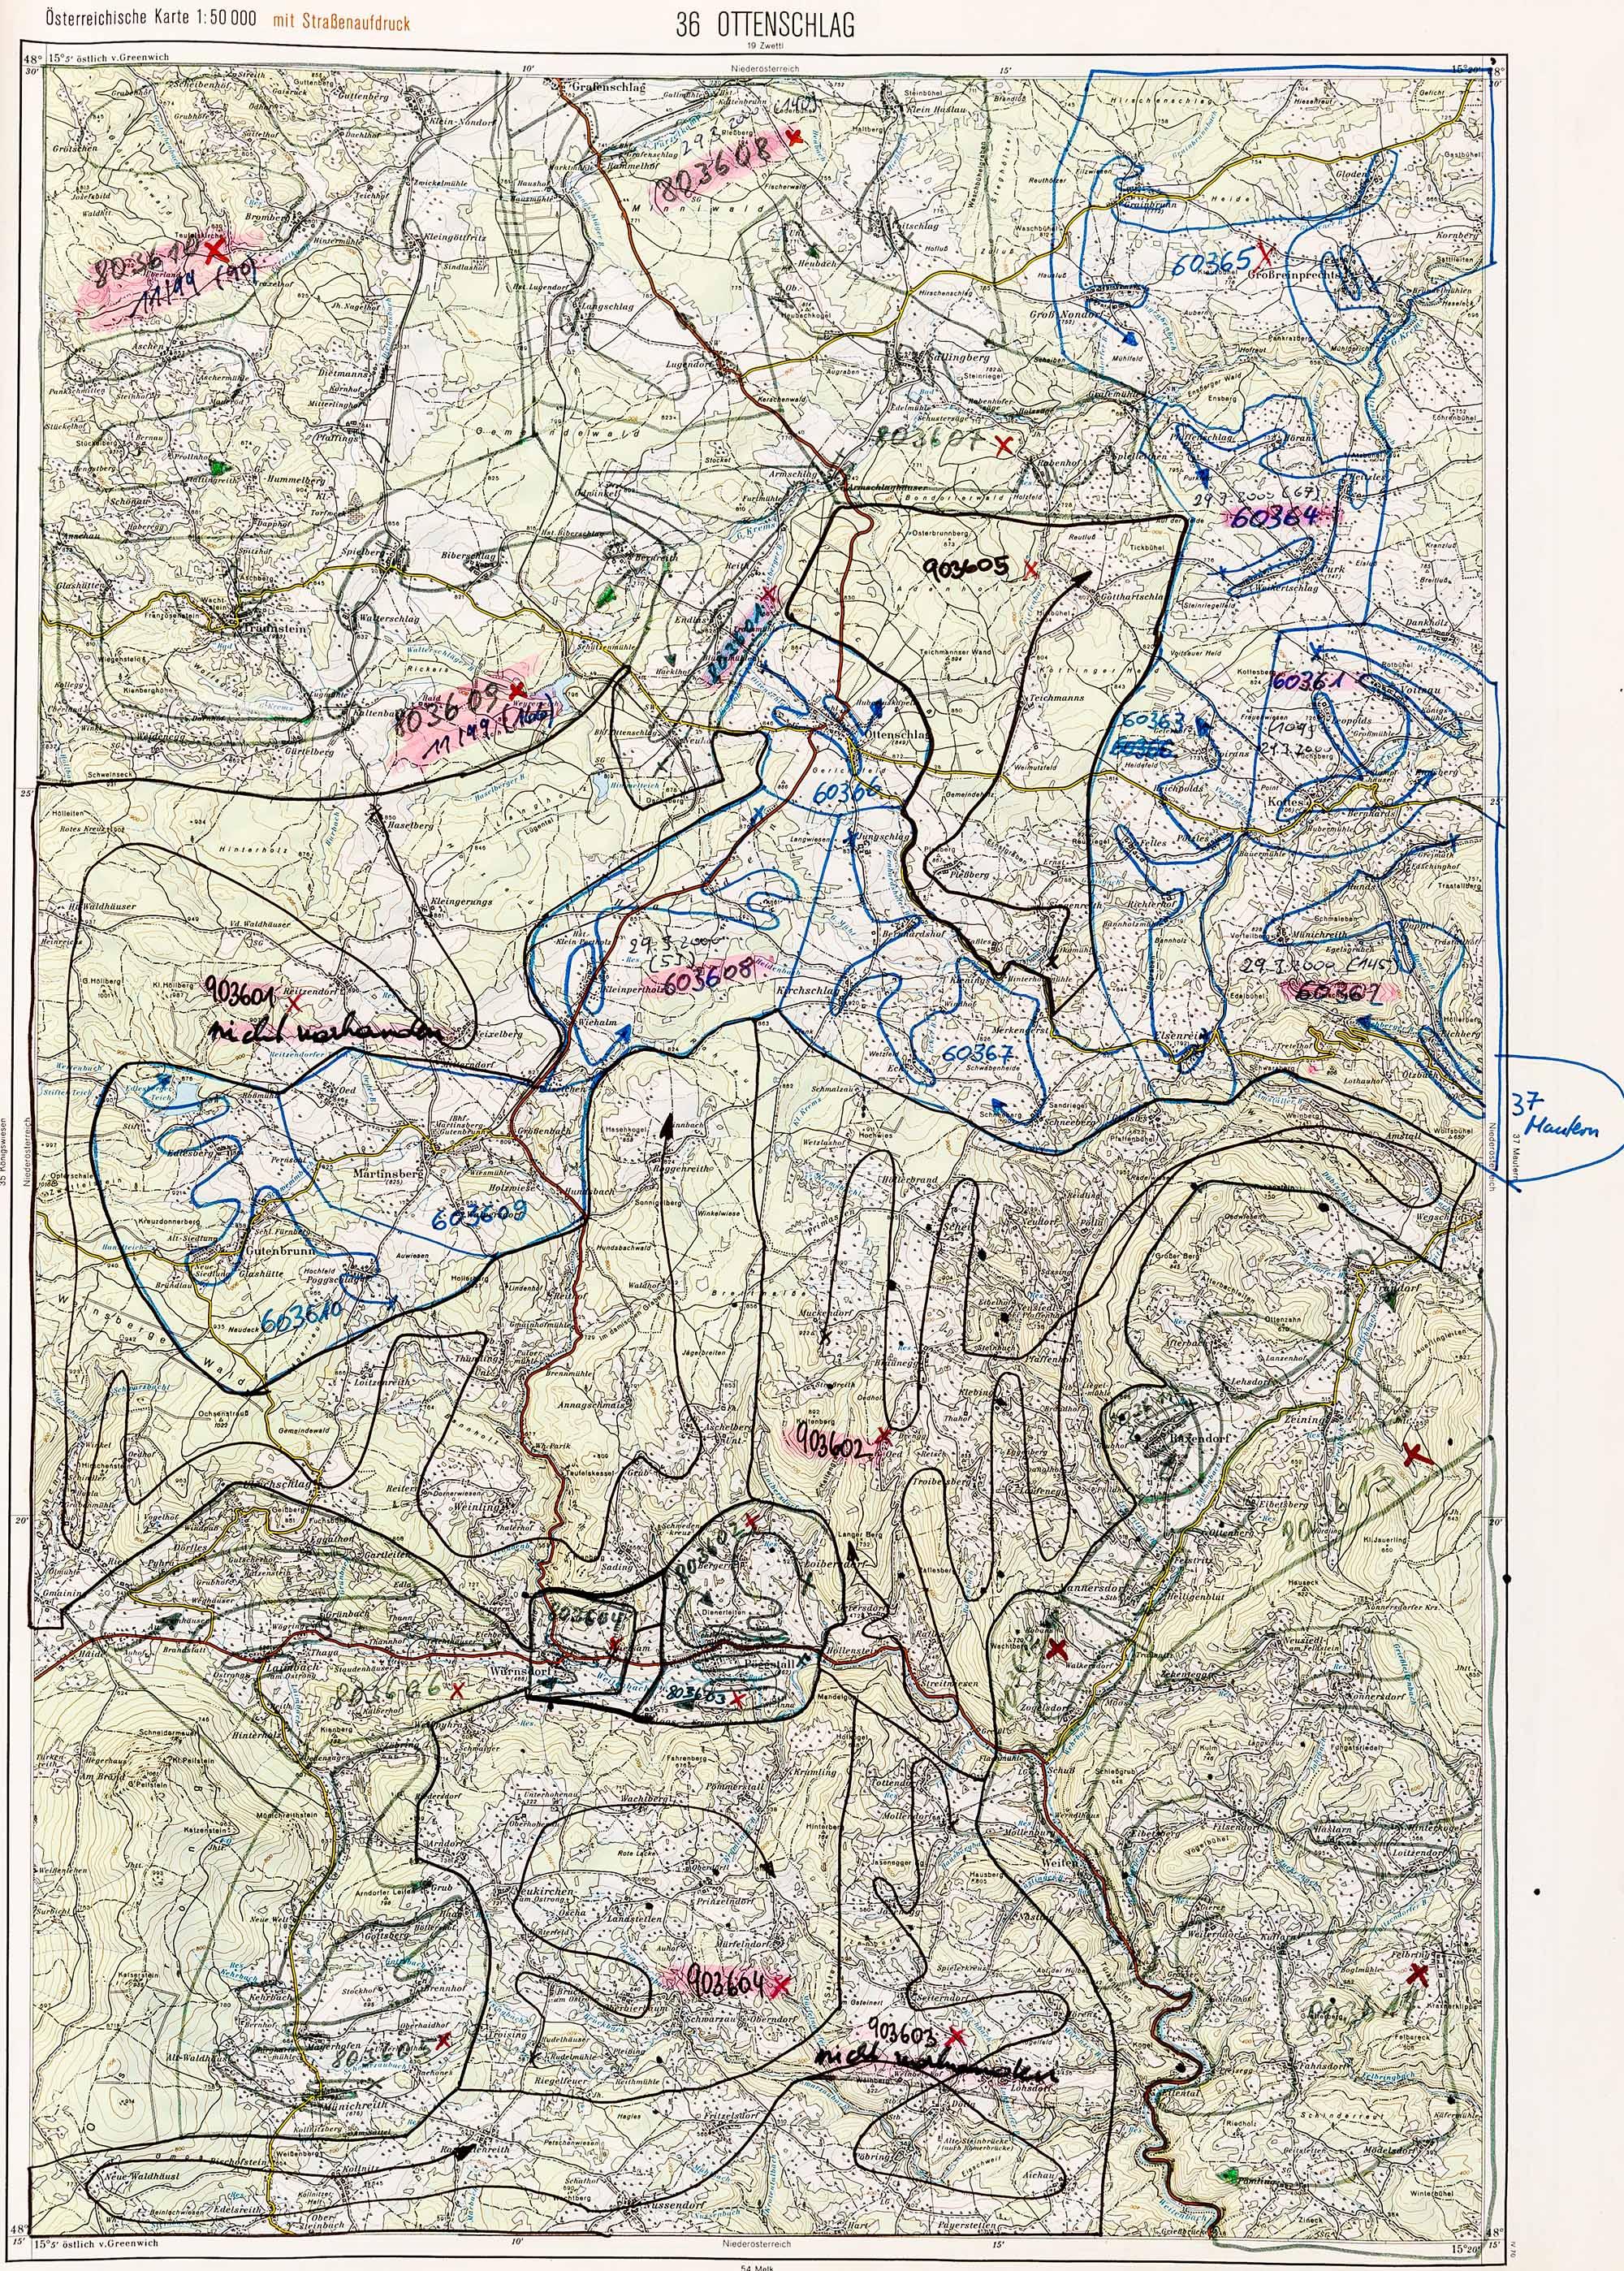 1975-1979 Karte 036